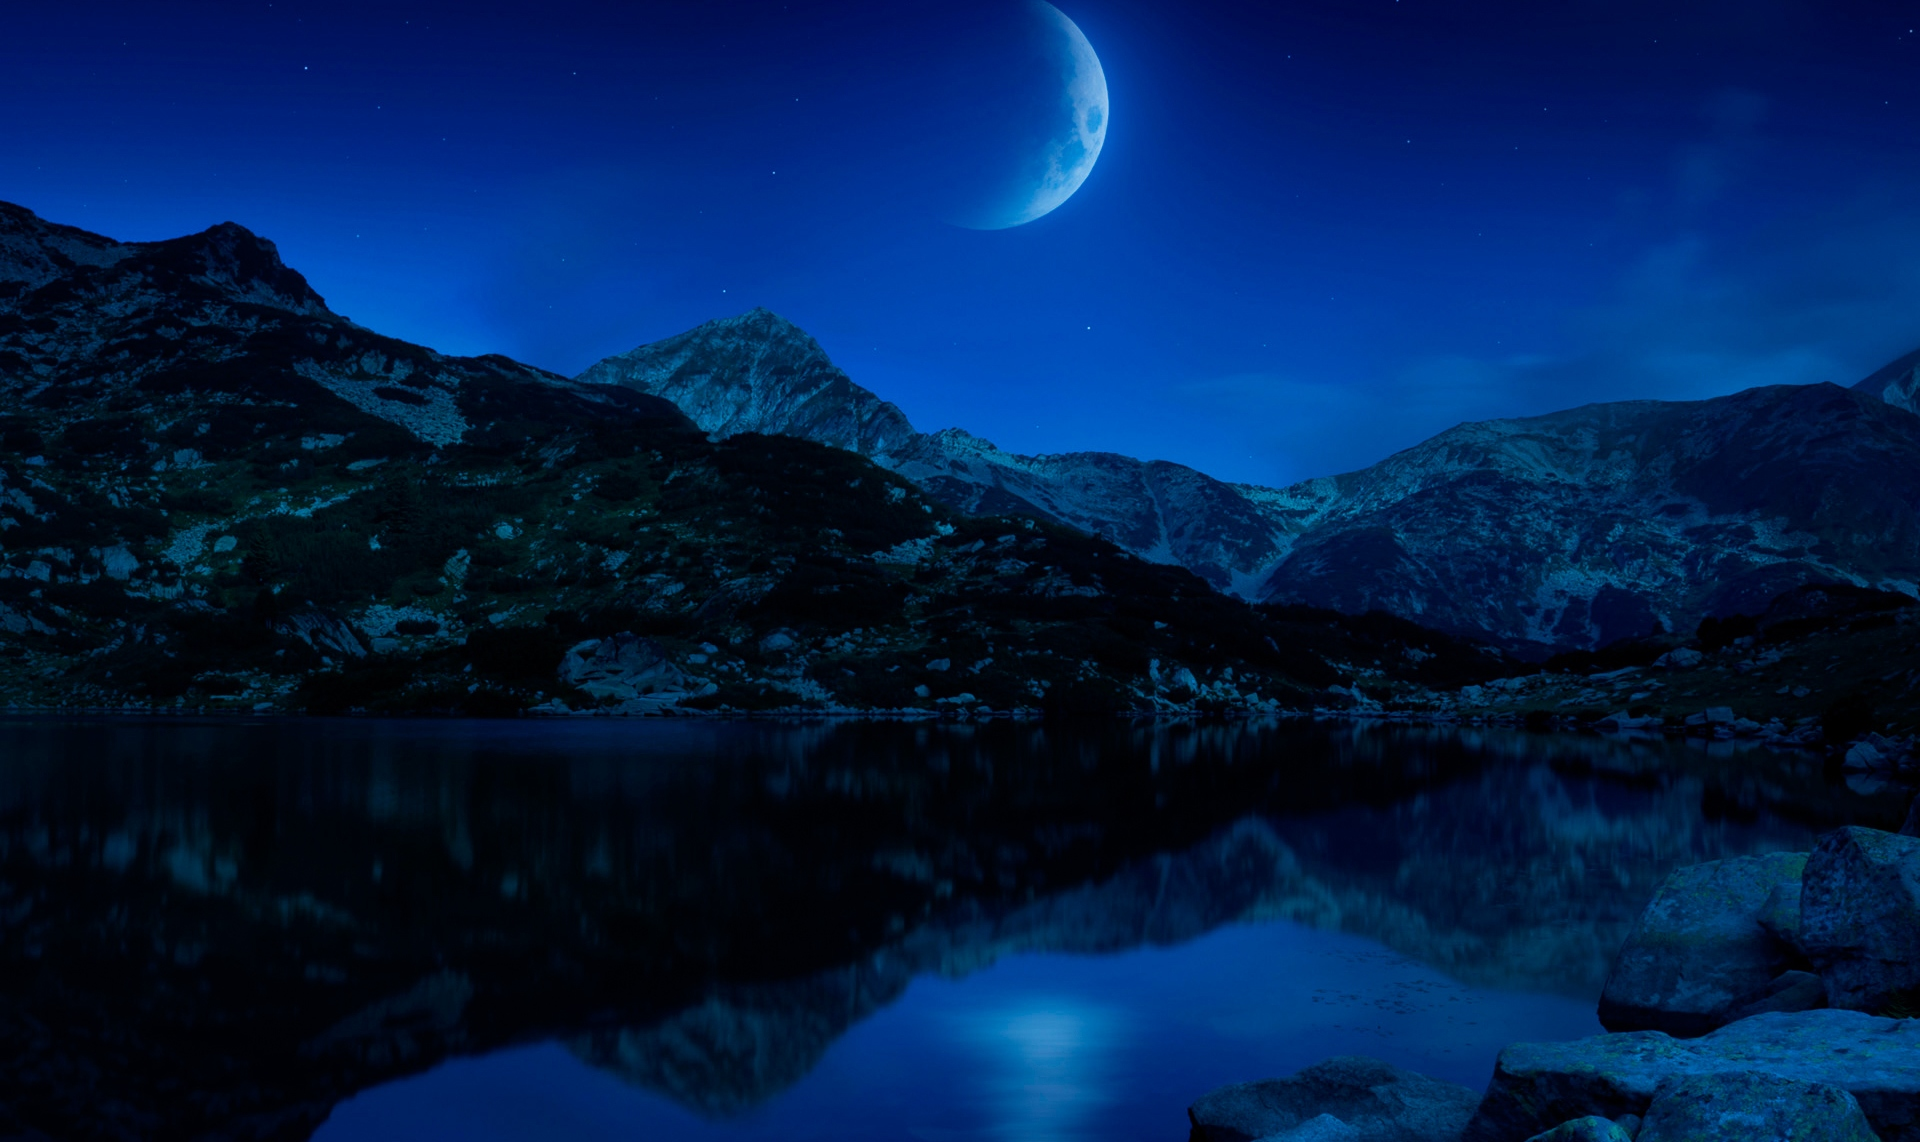 Moon Wallpaper Download Hd Desktop Wallpapers 4k Hd